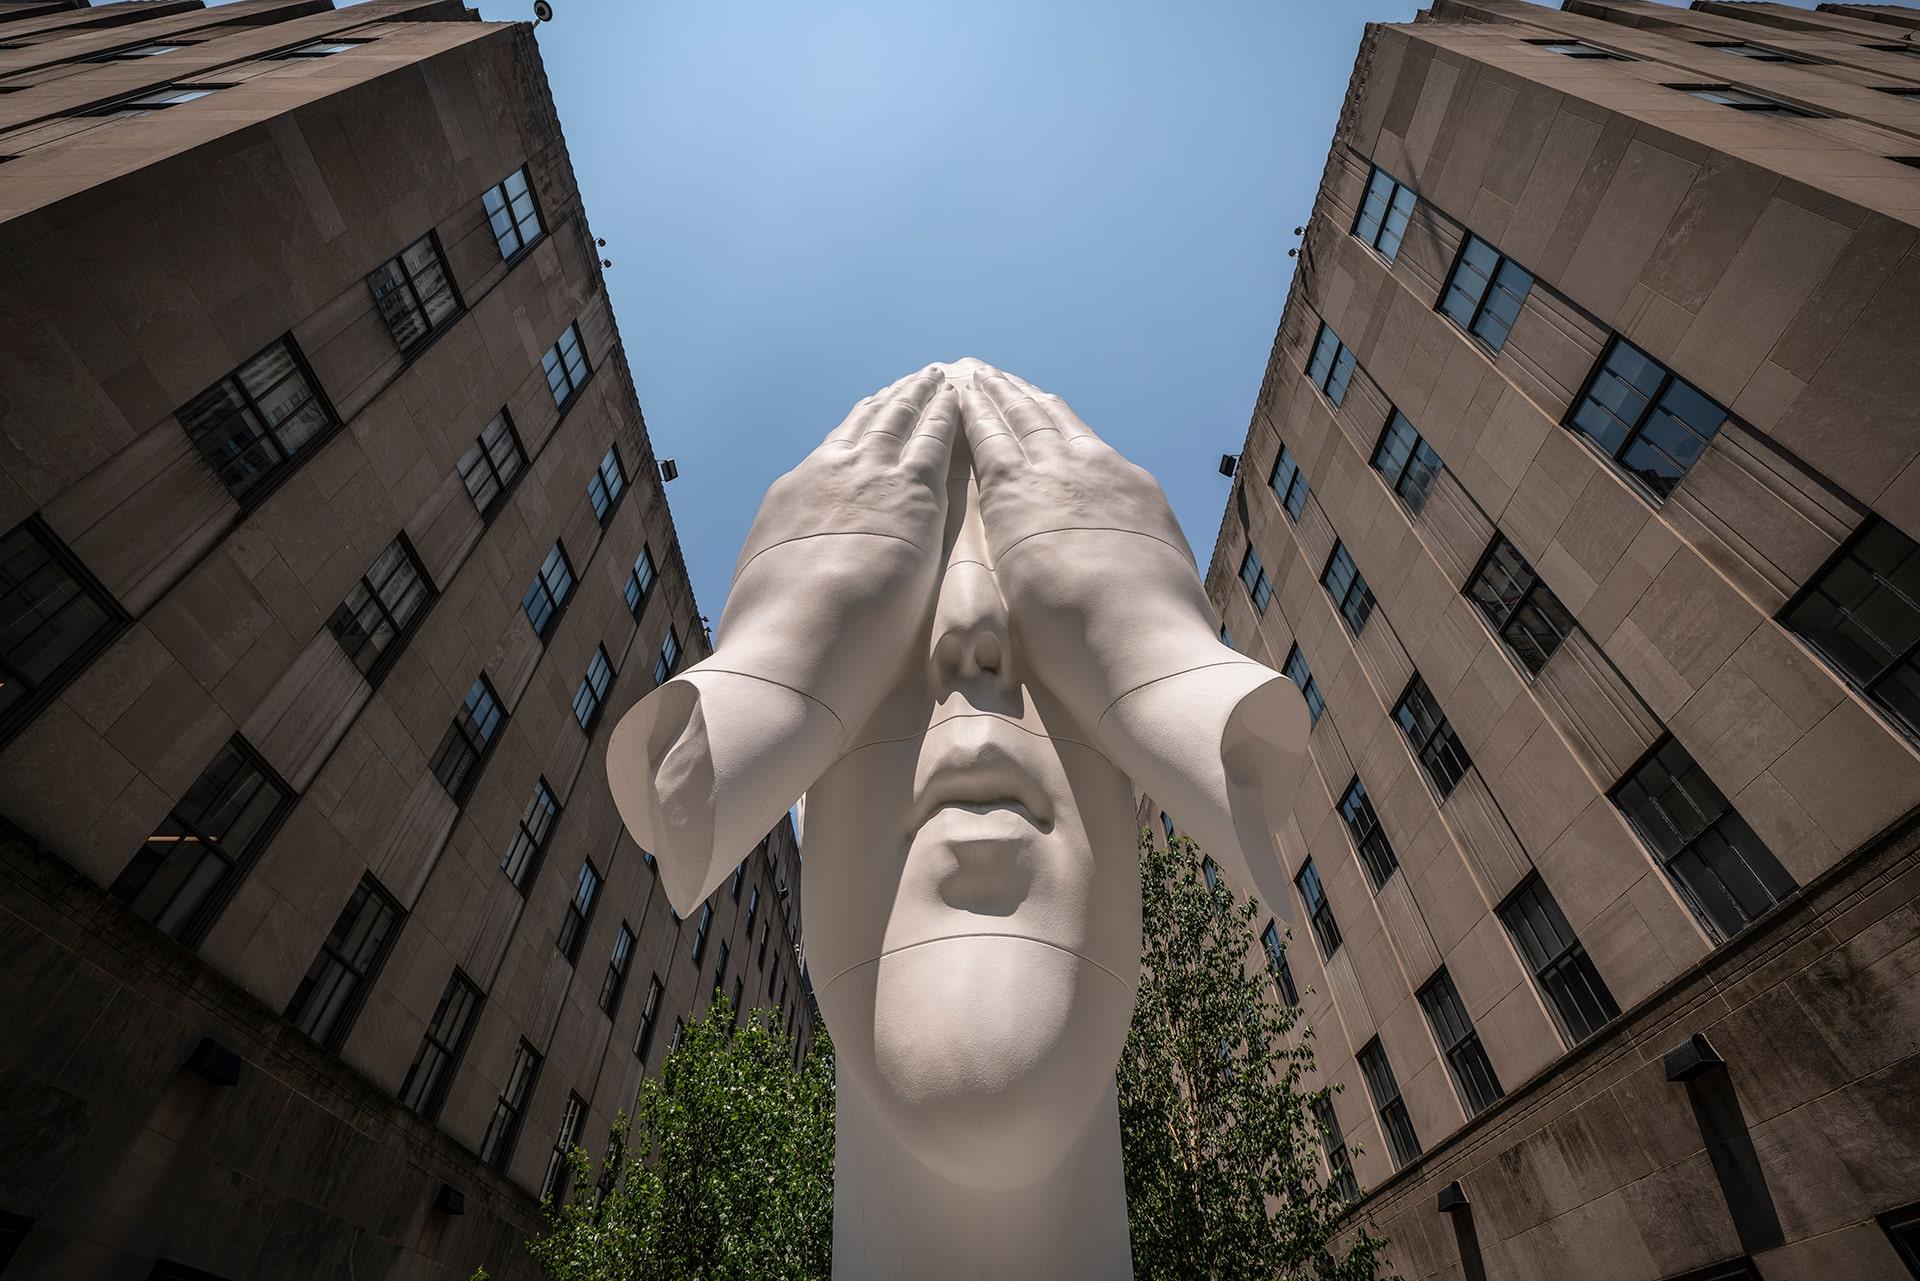 Blog Lifestyle - On s'en prend plein les yeux à New York - Suivre sa Joie - Saskia Parein